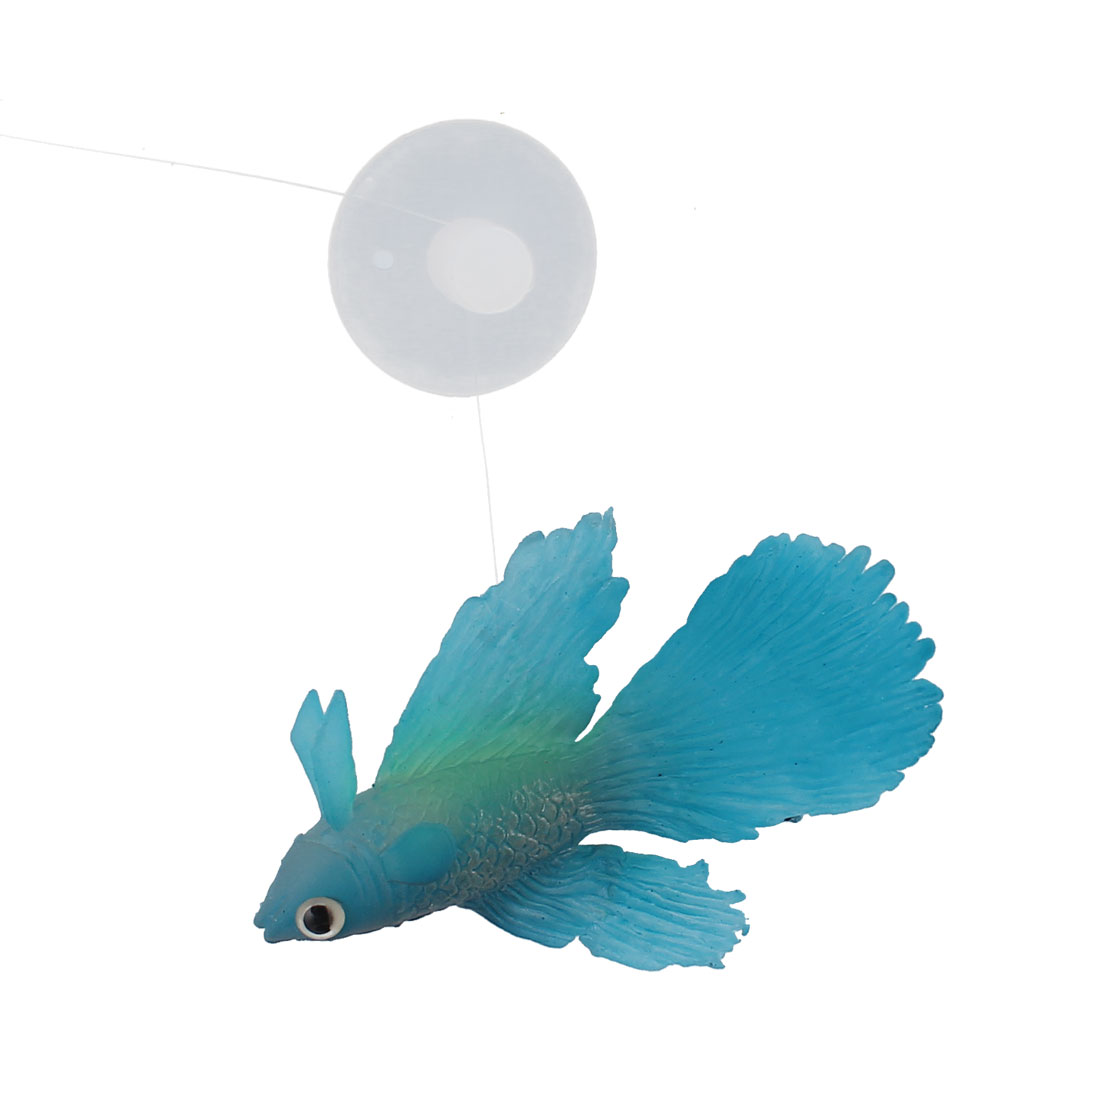 Aquarium Fish Tank Suction Cup Simulated Floating Betta Decor Ornament Blue